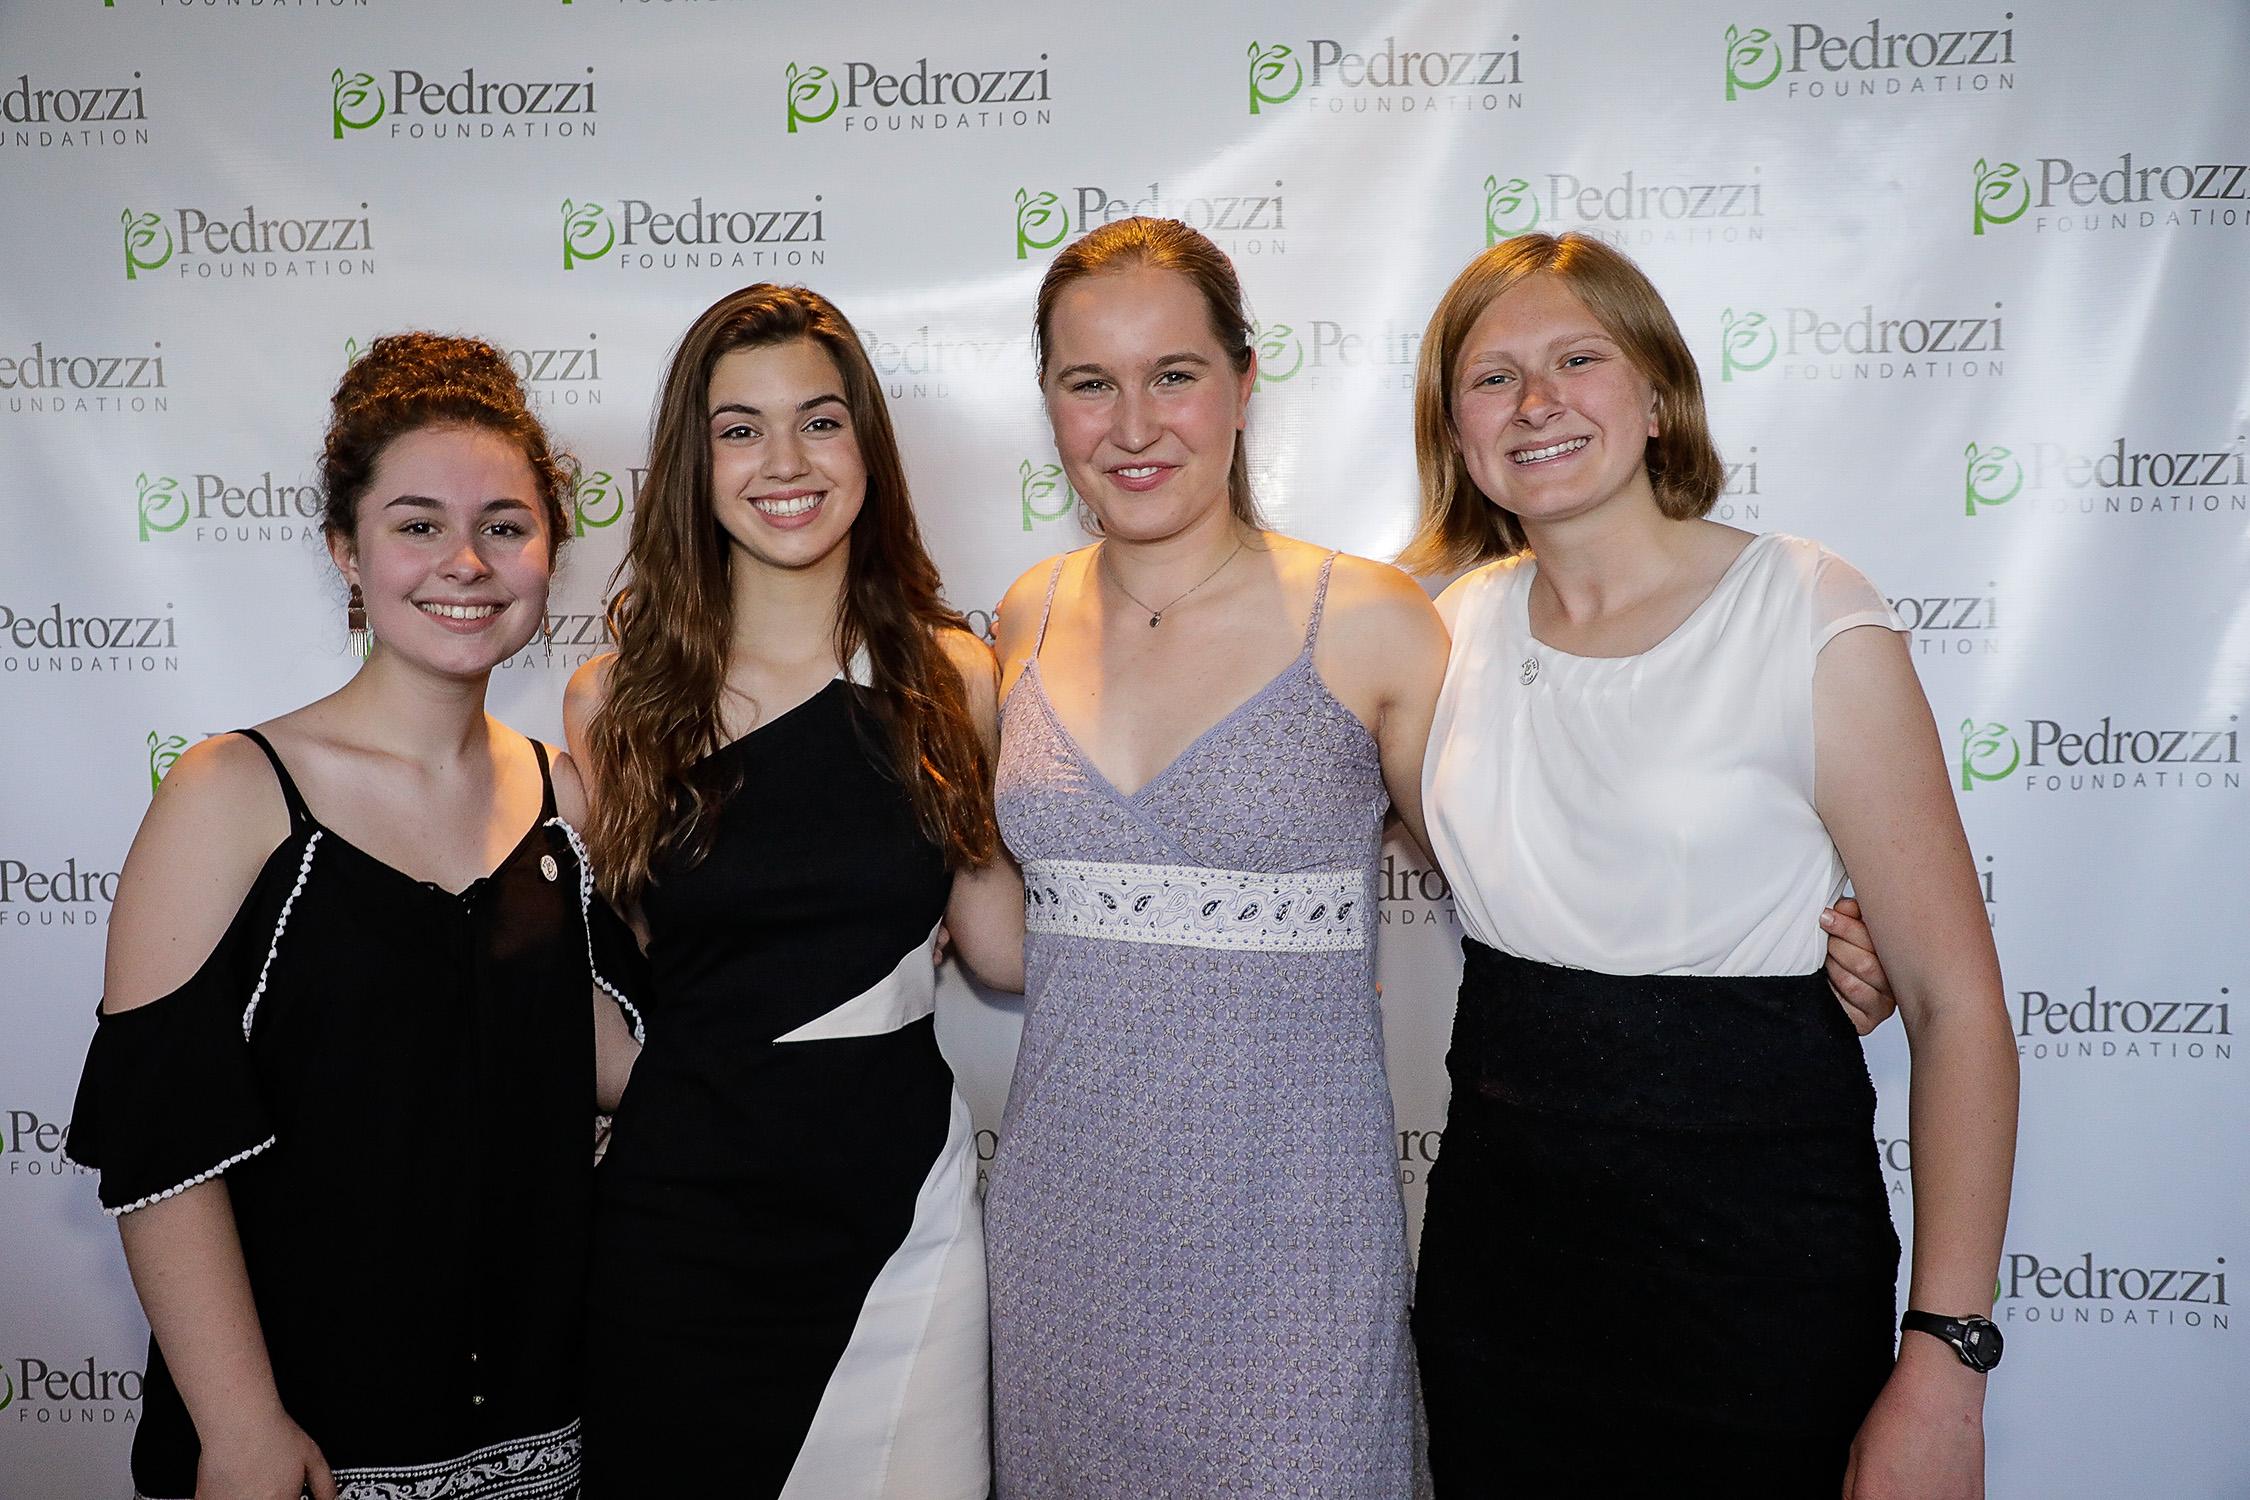 2019 Recognition Event Photos